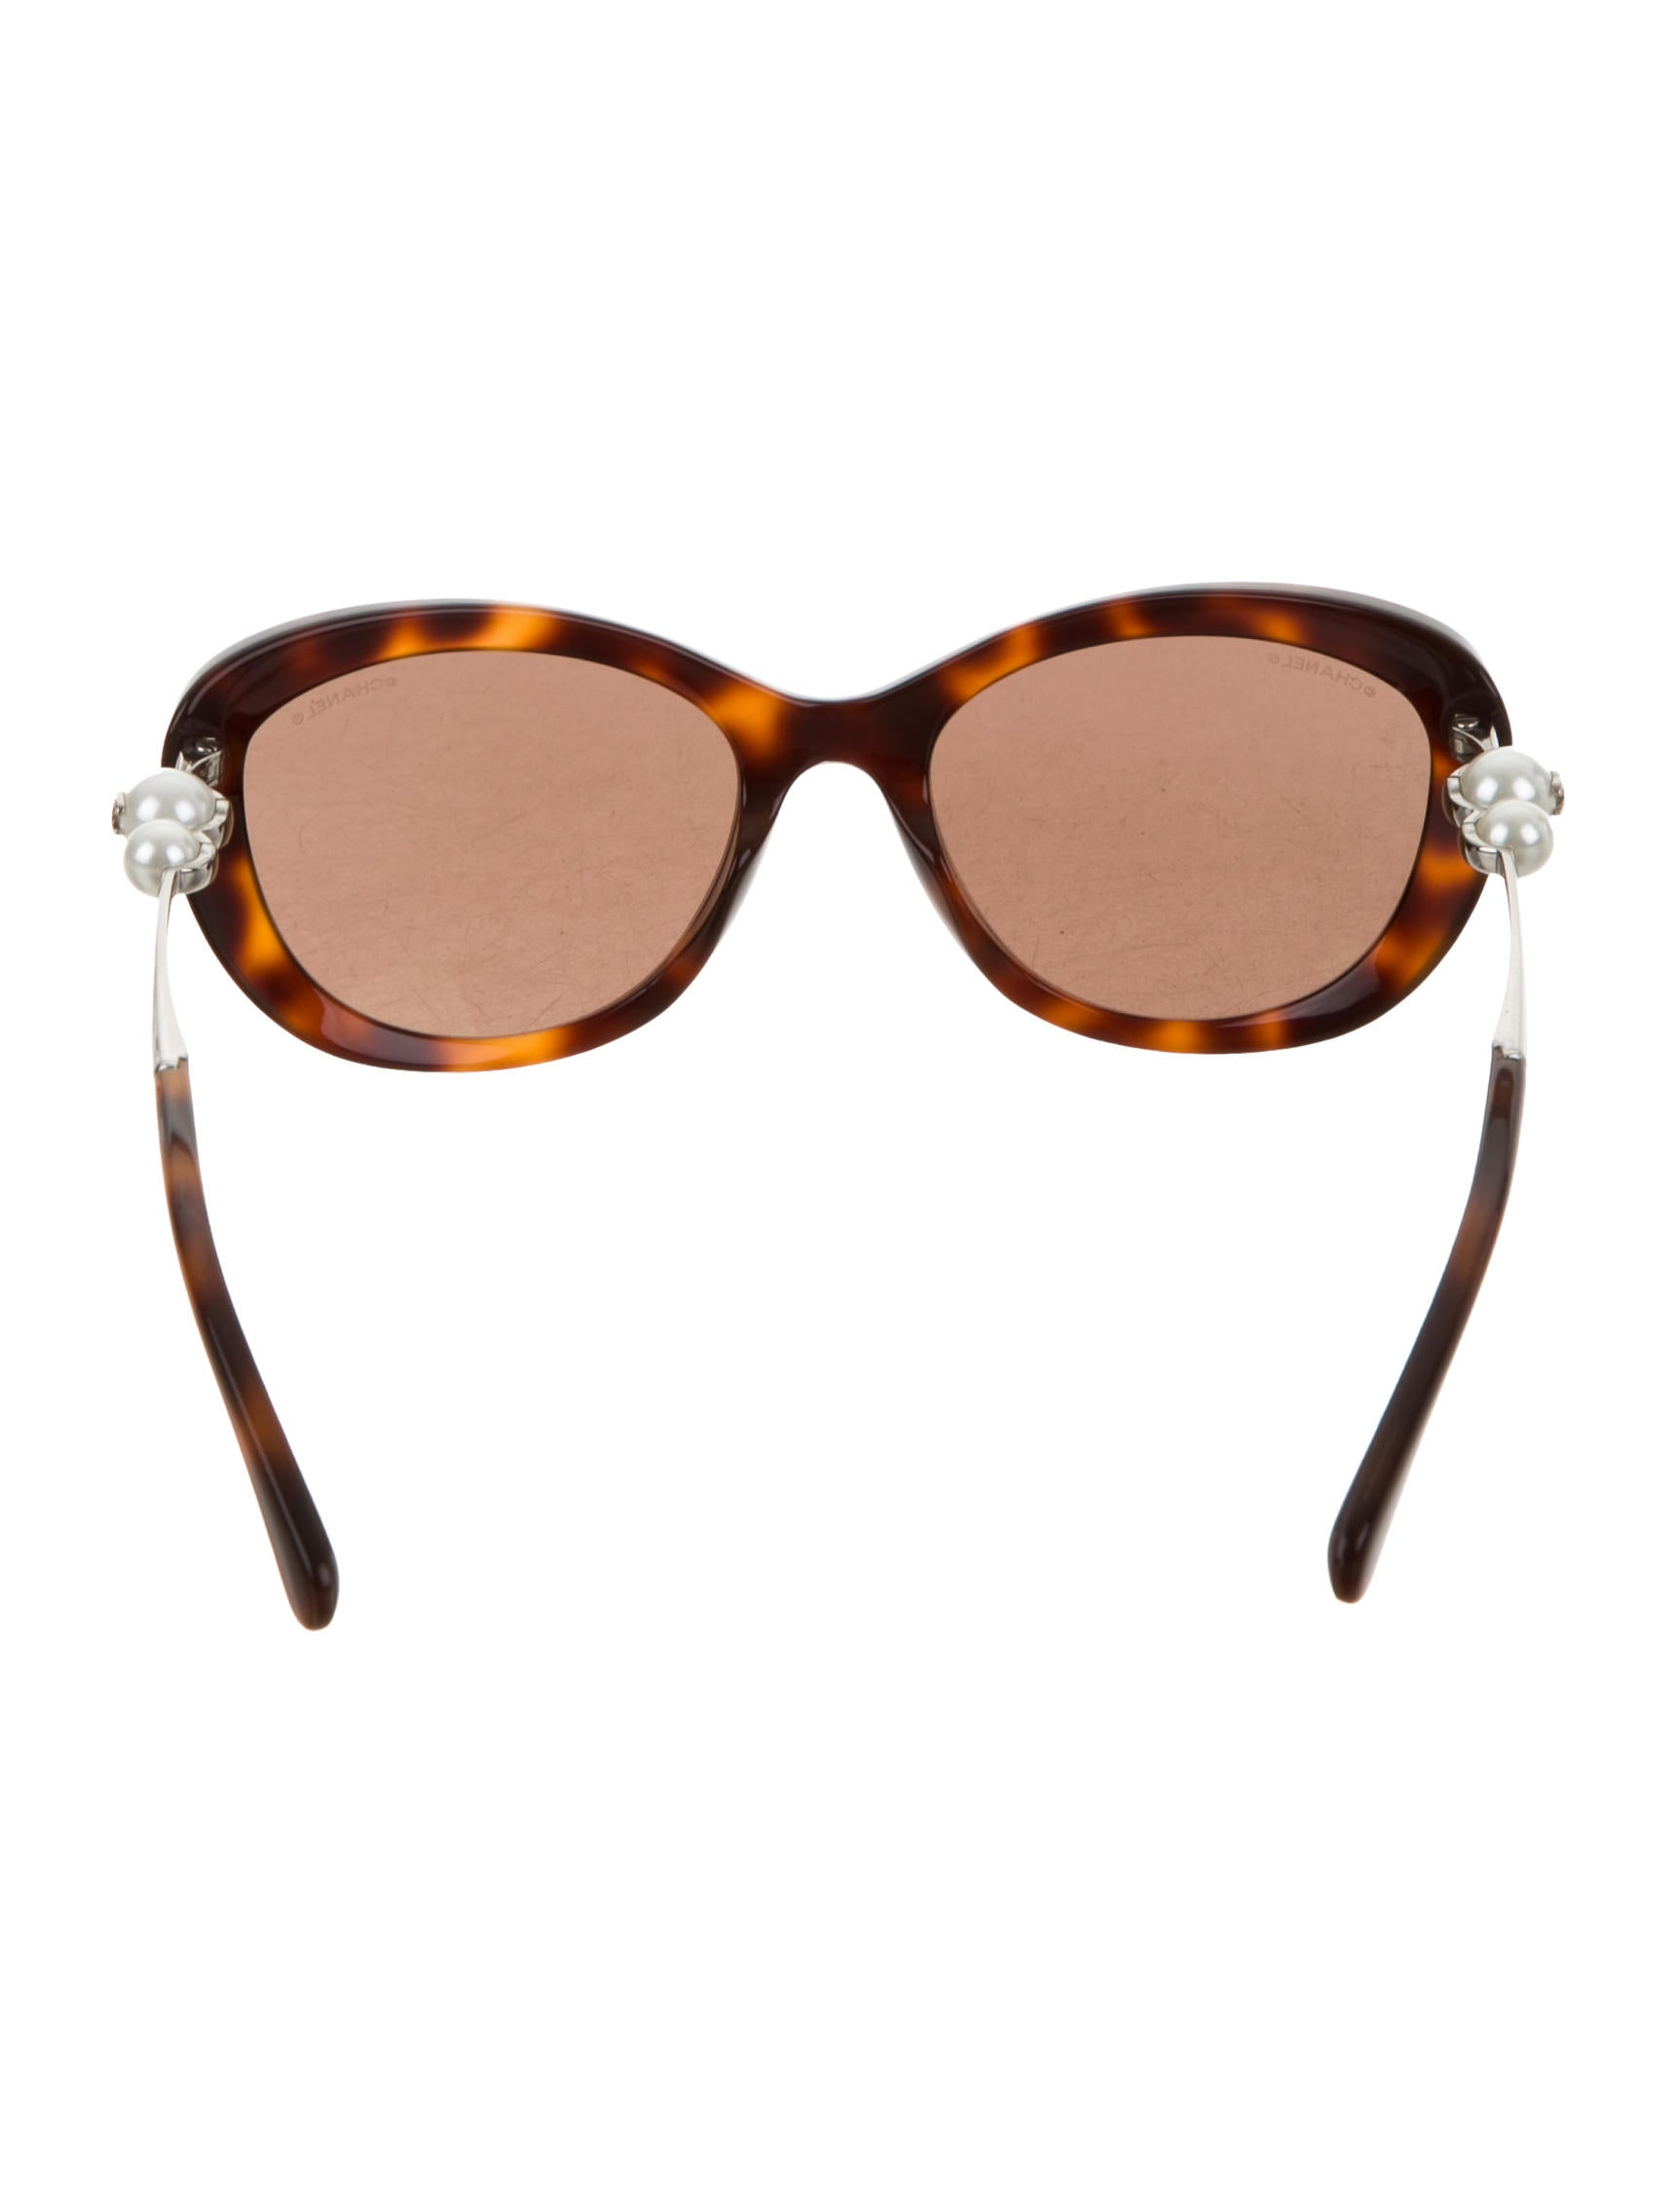 Chanel Cat Eye Pearl Sunglasses